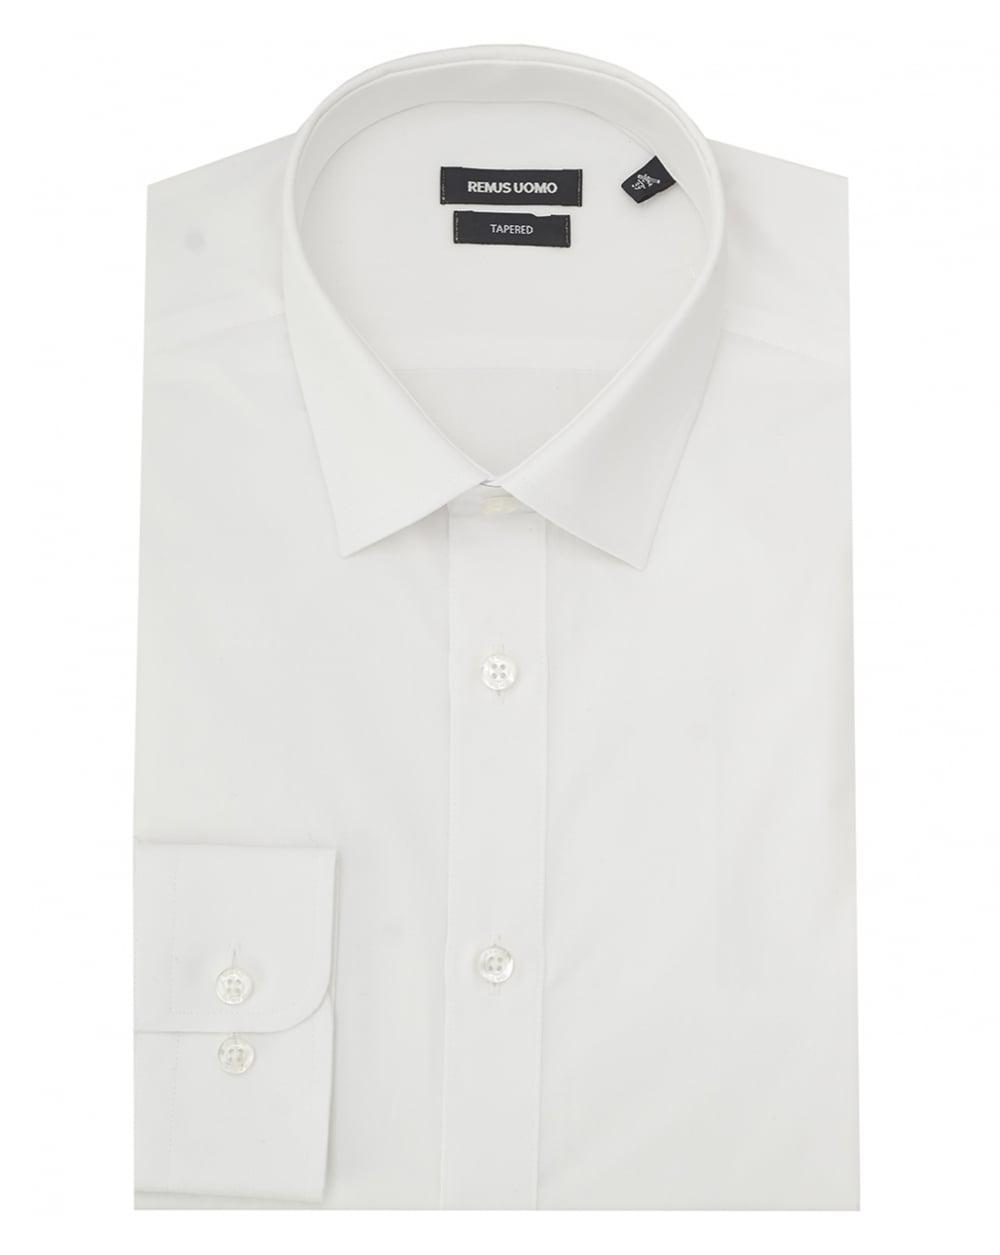 Lyst Remus Uomo Plain Cutaway Collar Shirt In White For Men